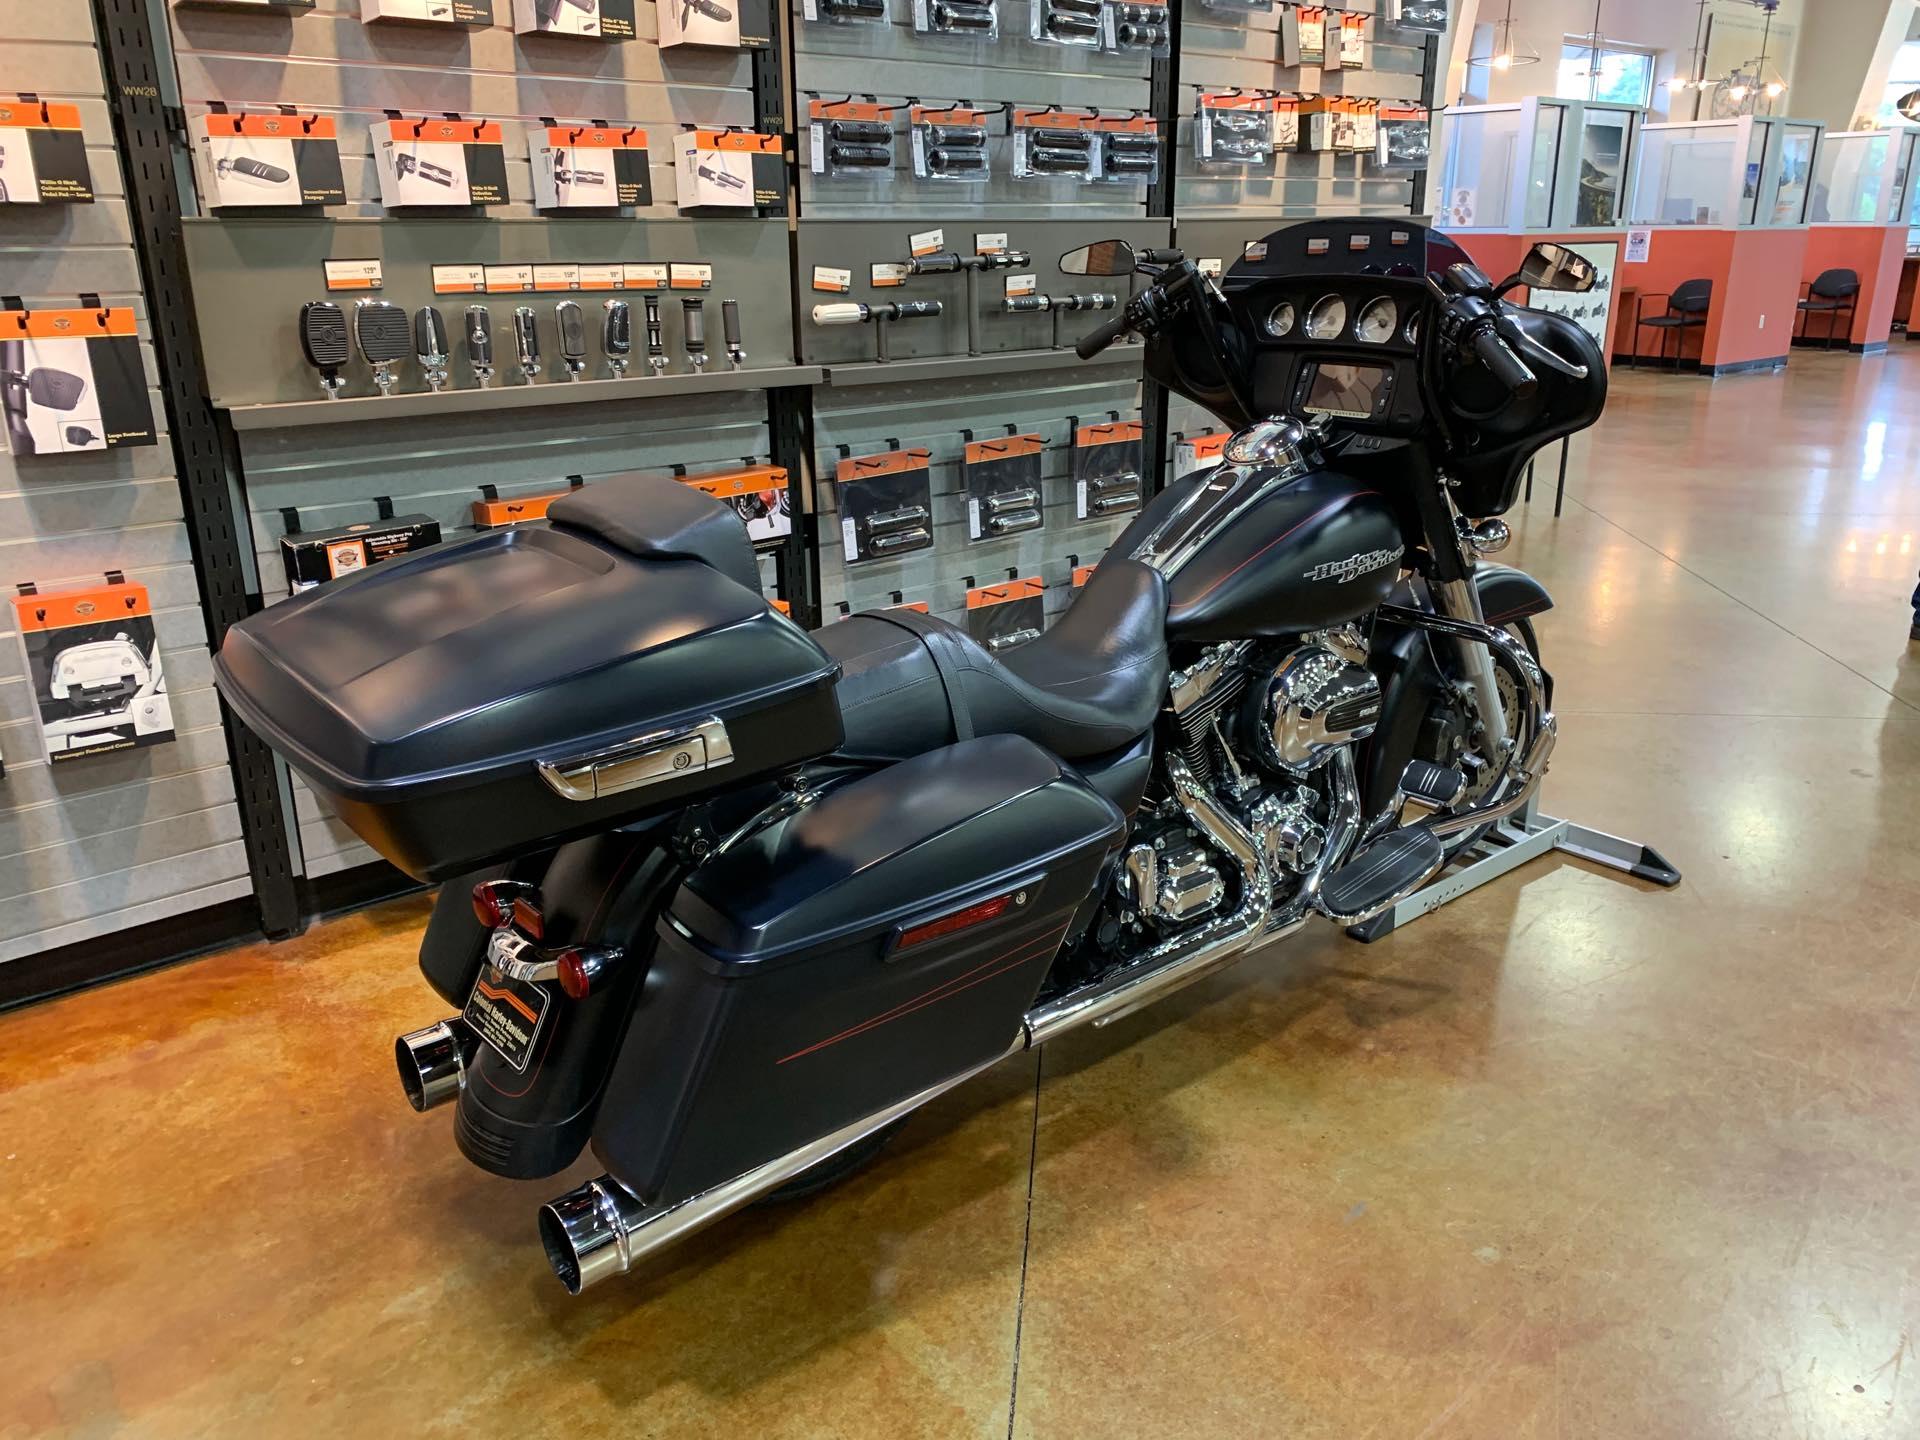 2016 Harley-Davidson Street Glide Special at Colonial Harley-Davidson